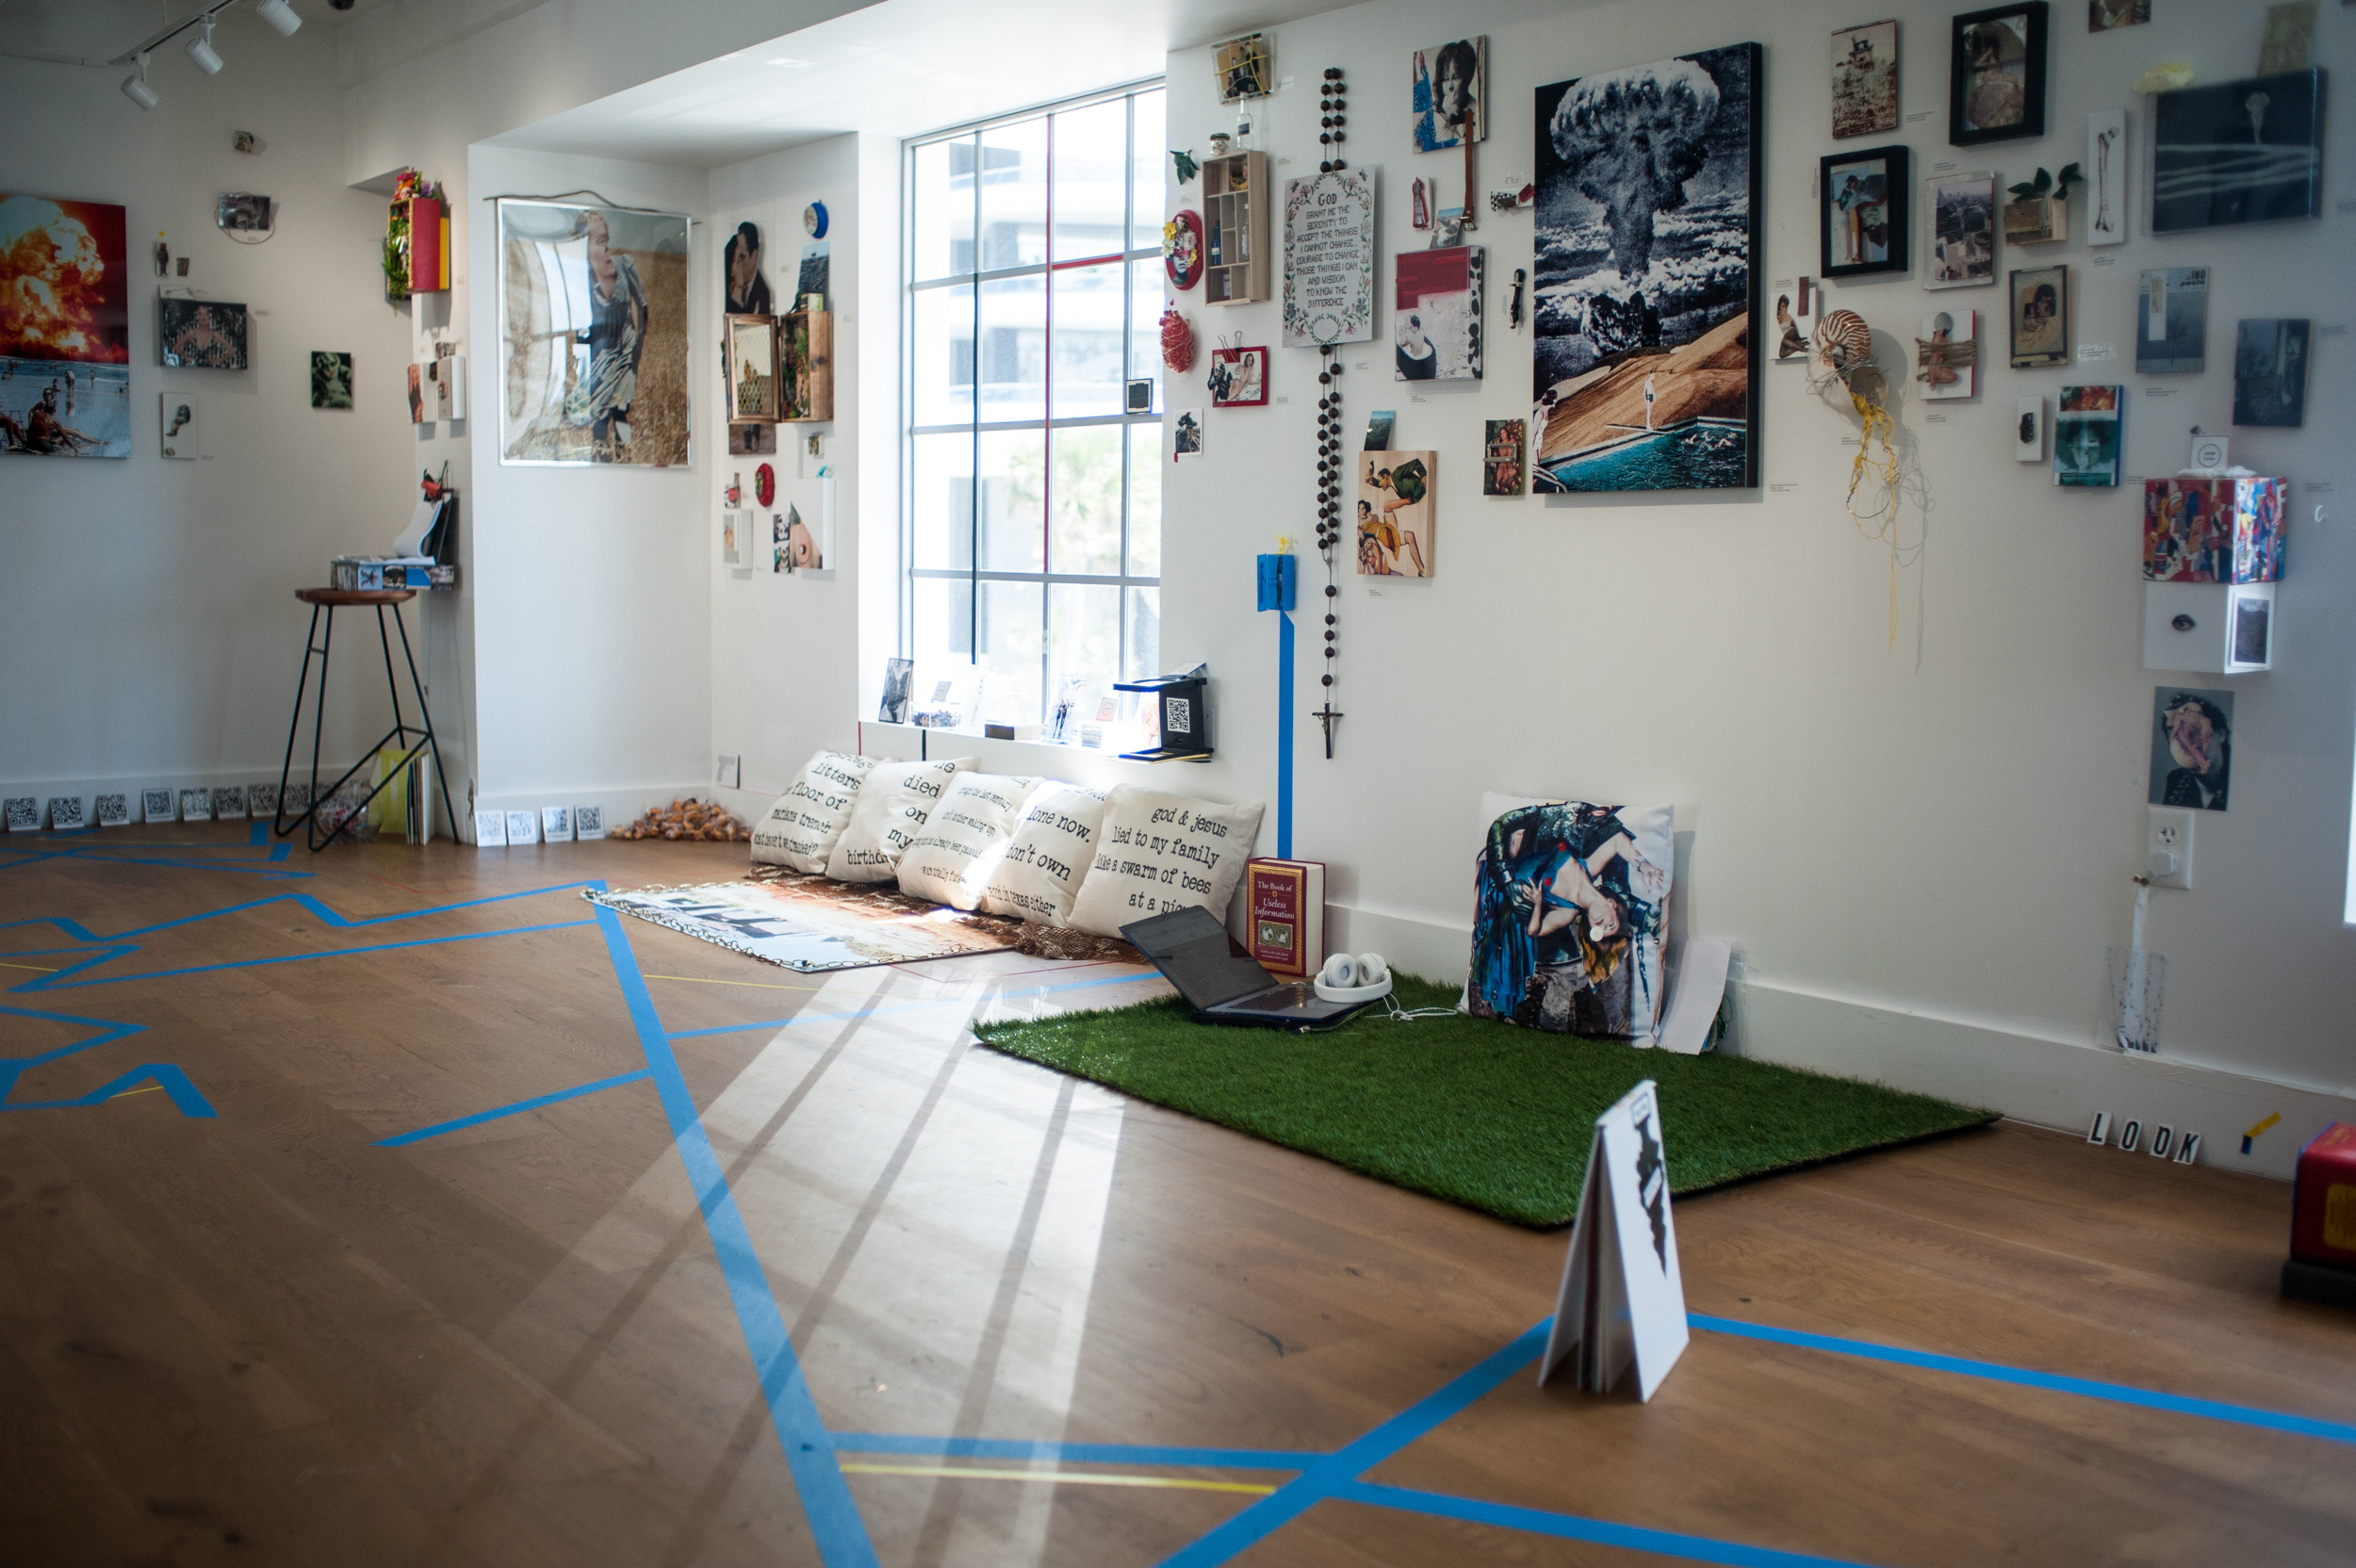 Faena-Exhibition-Images-67.jpg